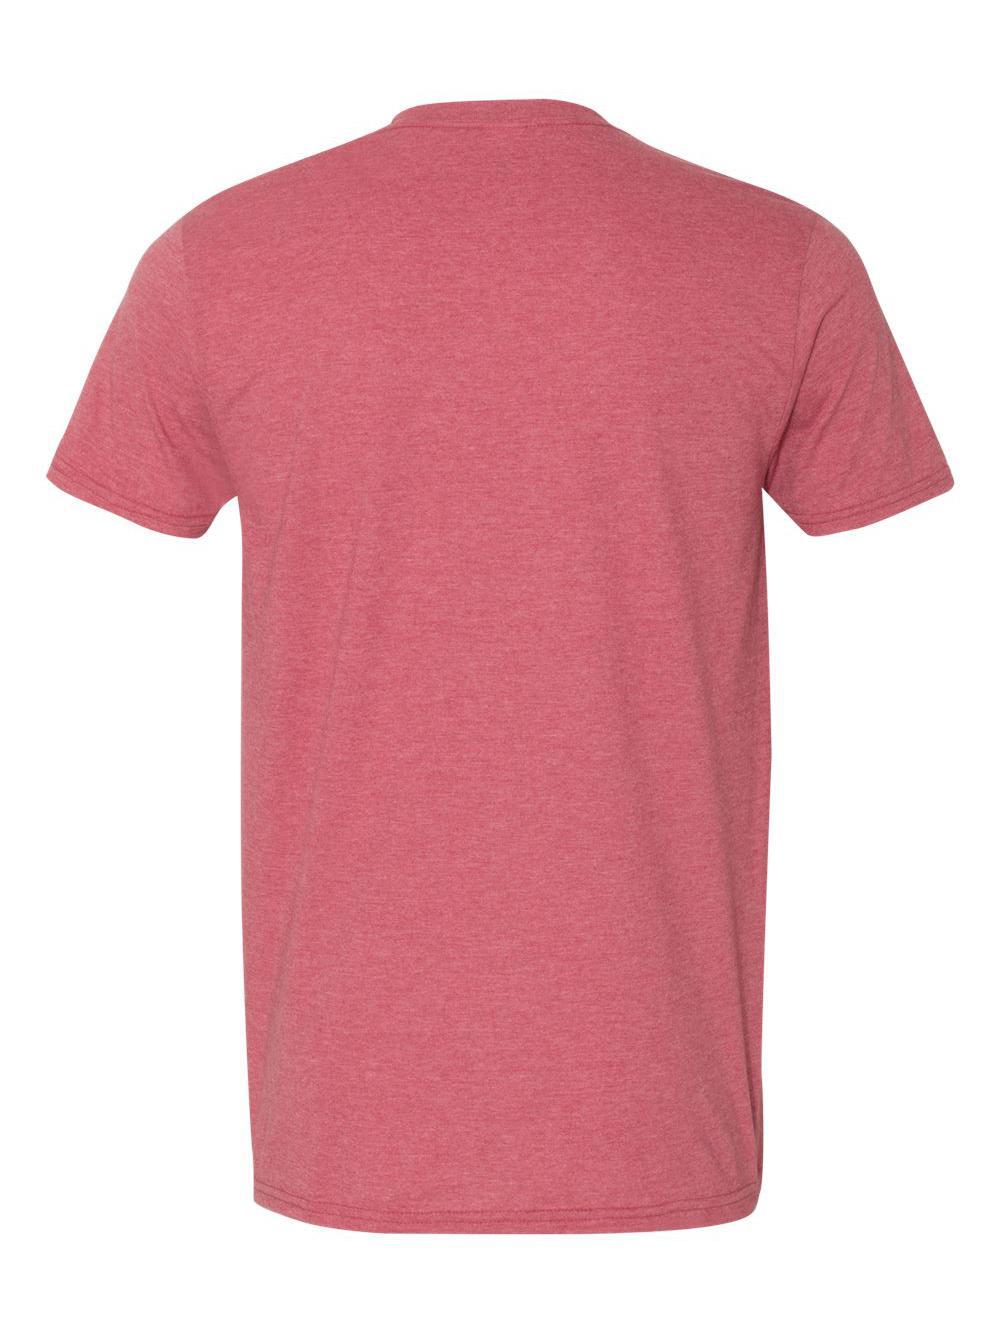 Gildan-Softstyle-T-Shirt-64000 thumbnail 61